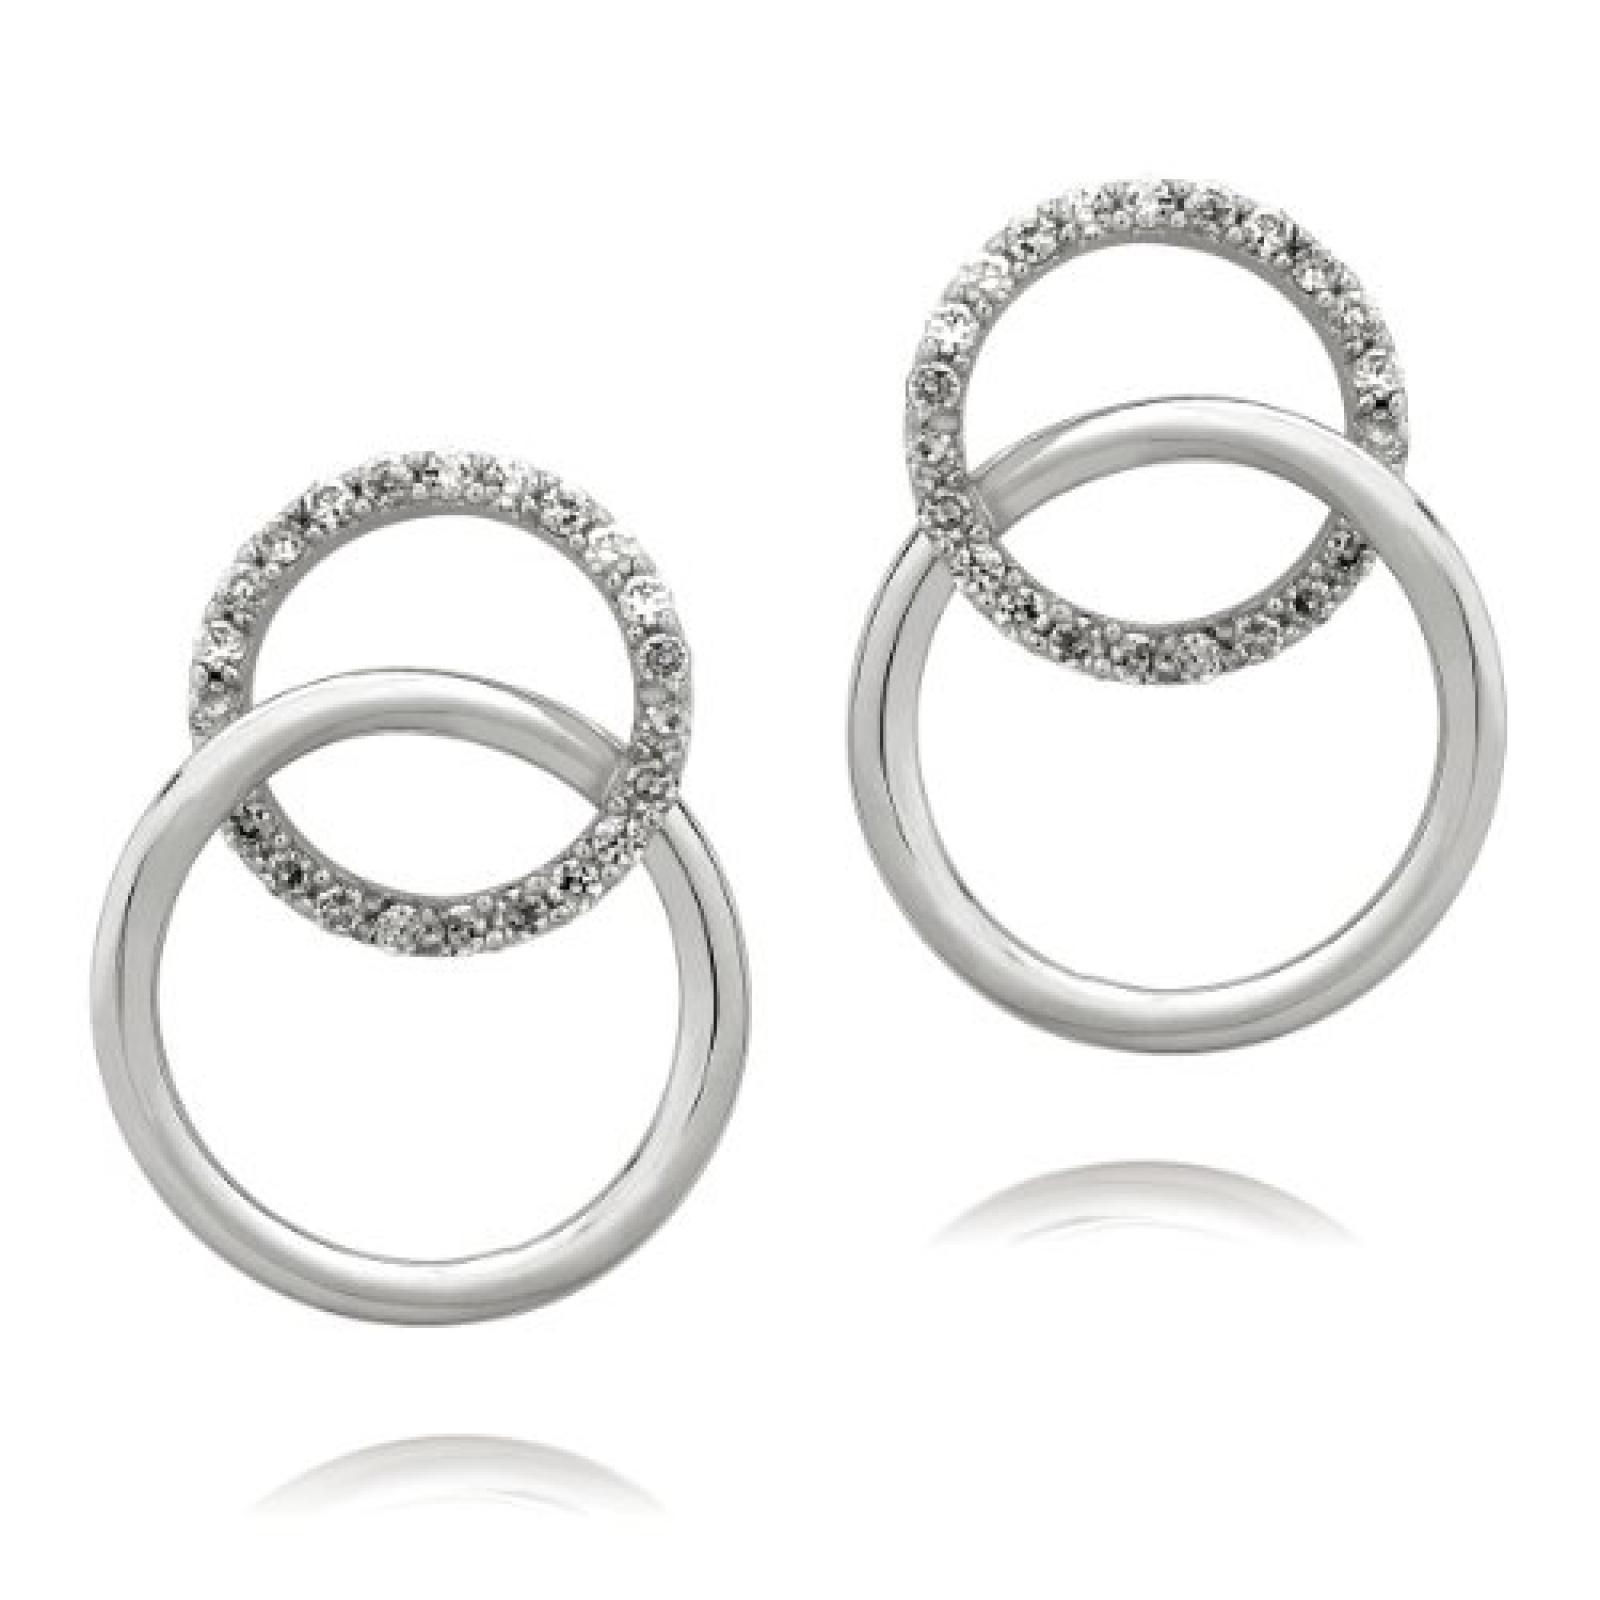 Rafaela Donata Glamour Collection Damen-Ohrstecker 925 Sterling Silber Zirkonia weiß  60832008